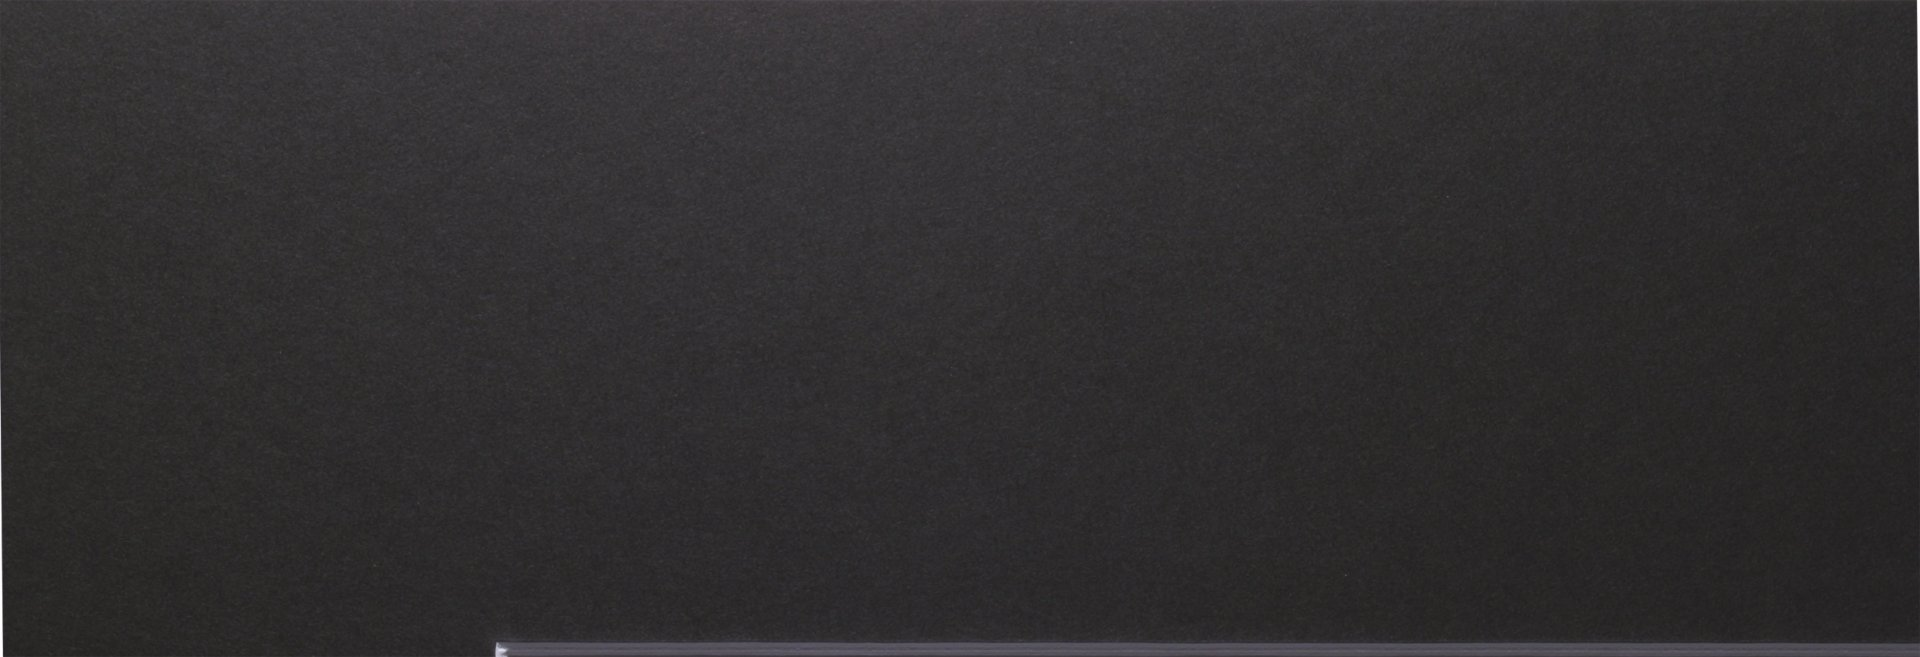 GSRM921_G921 Smooth Black